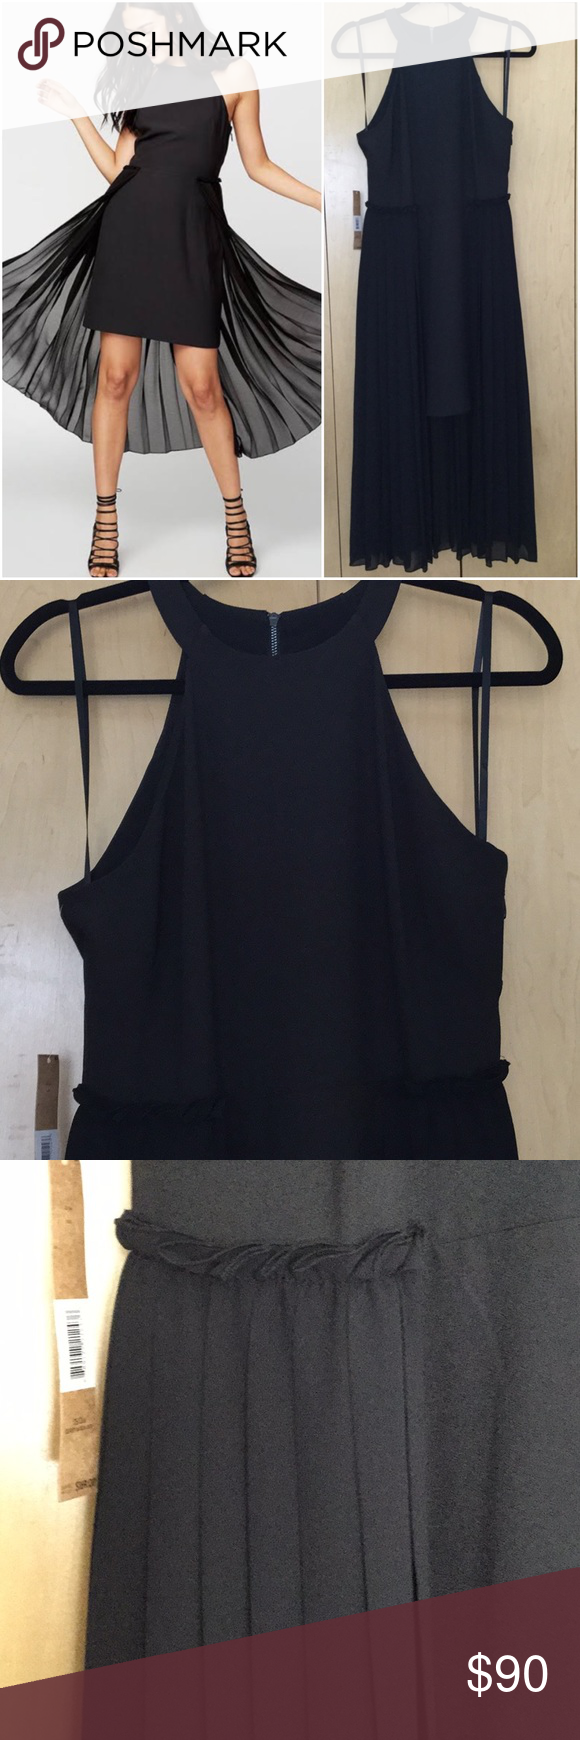 "Rachel Rachel Roy Womens Pleated Chiffon Overlay Rachel Rachel Roy NEW Black Women's Pleated Halter Sheath Dress, fully lining , double zipper, size and back  bust 15.5"", long length 50"", miniskirt length 35"", waist 15"".  #0023 RACHEL Rachel Roy Dresses Midi"